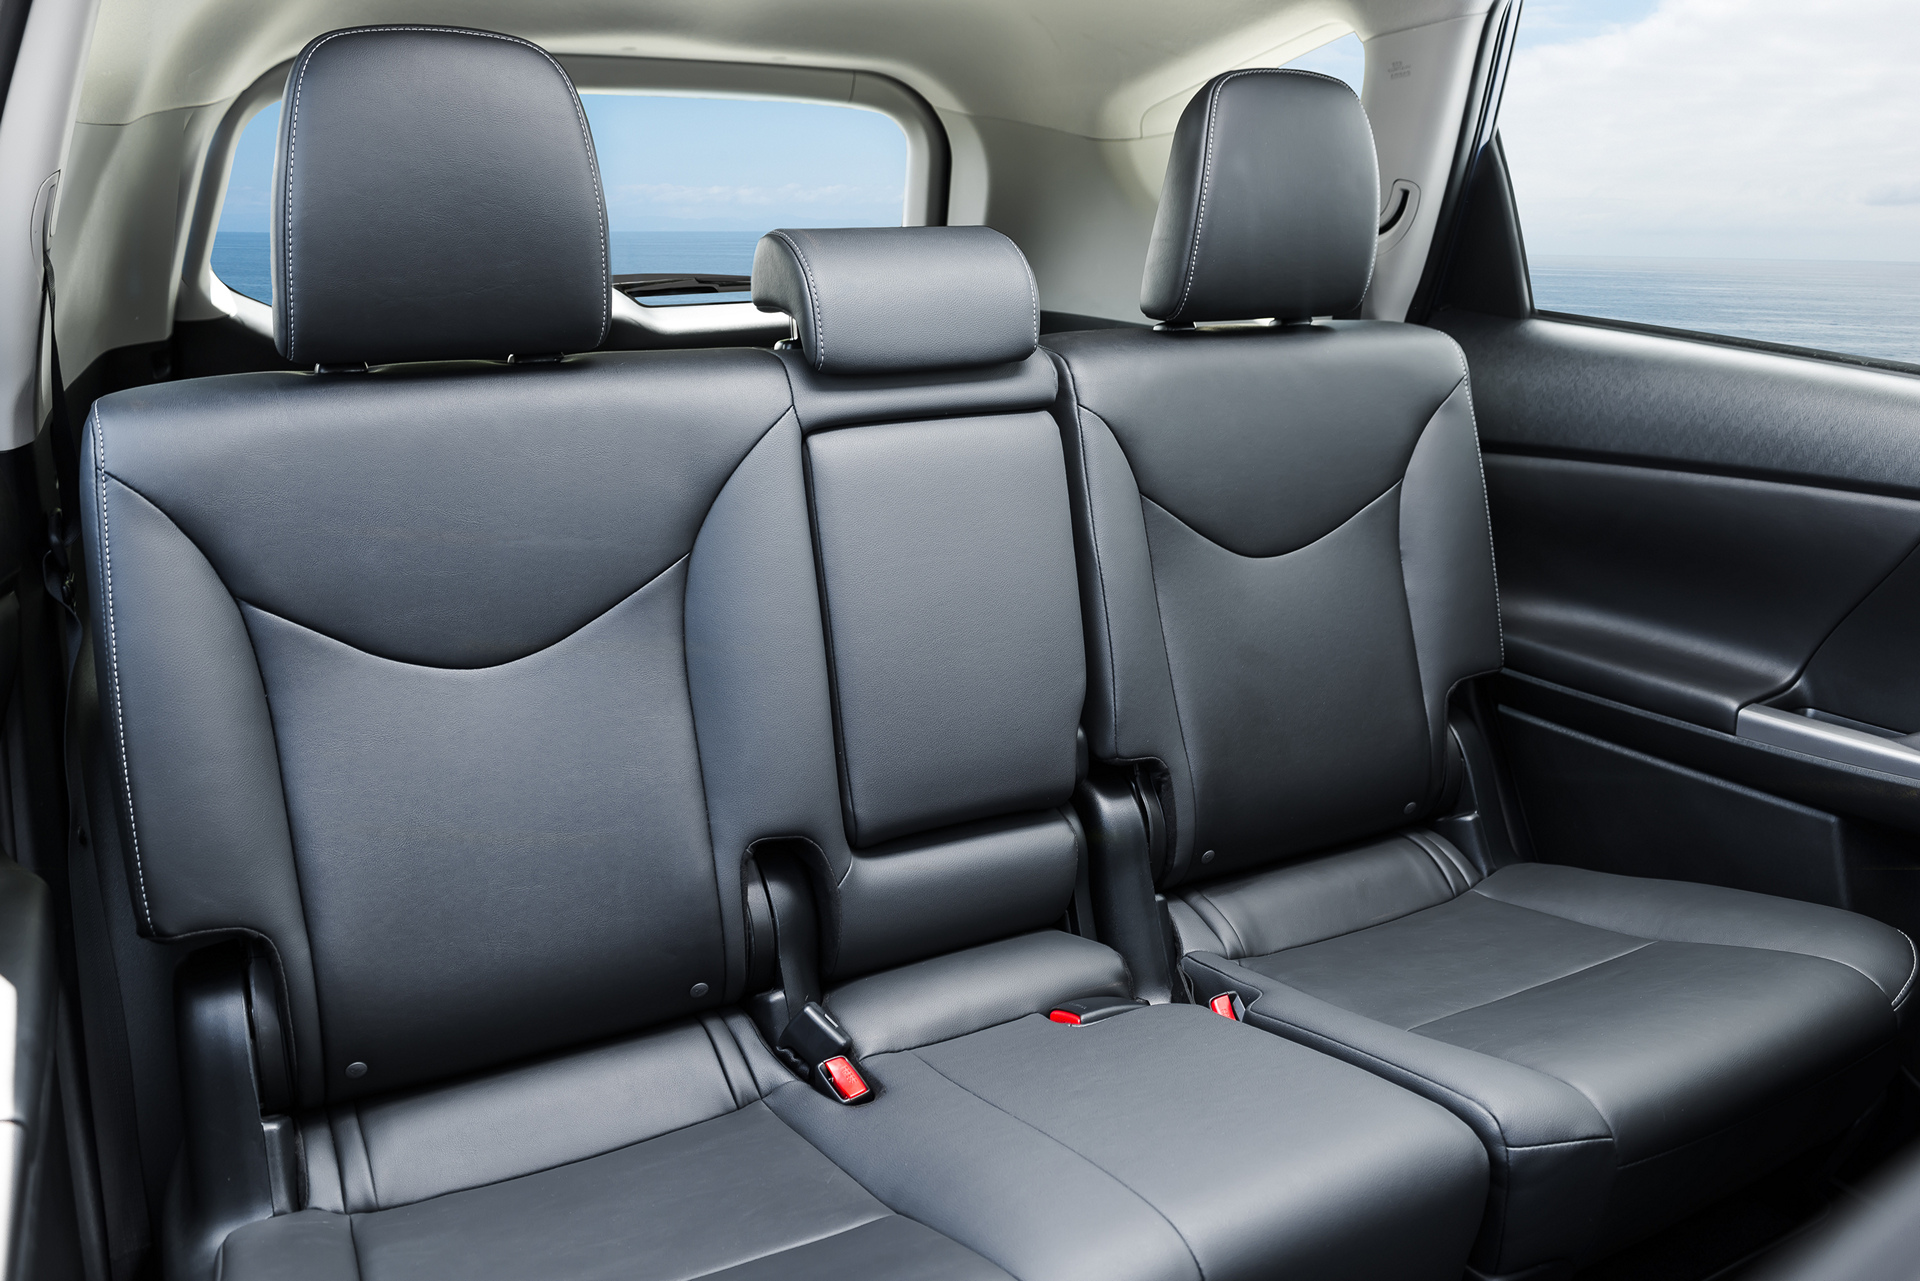 2016 Toyota Prius v © Toyota Motor Corporation